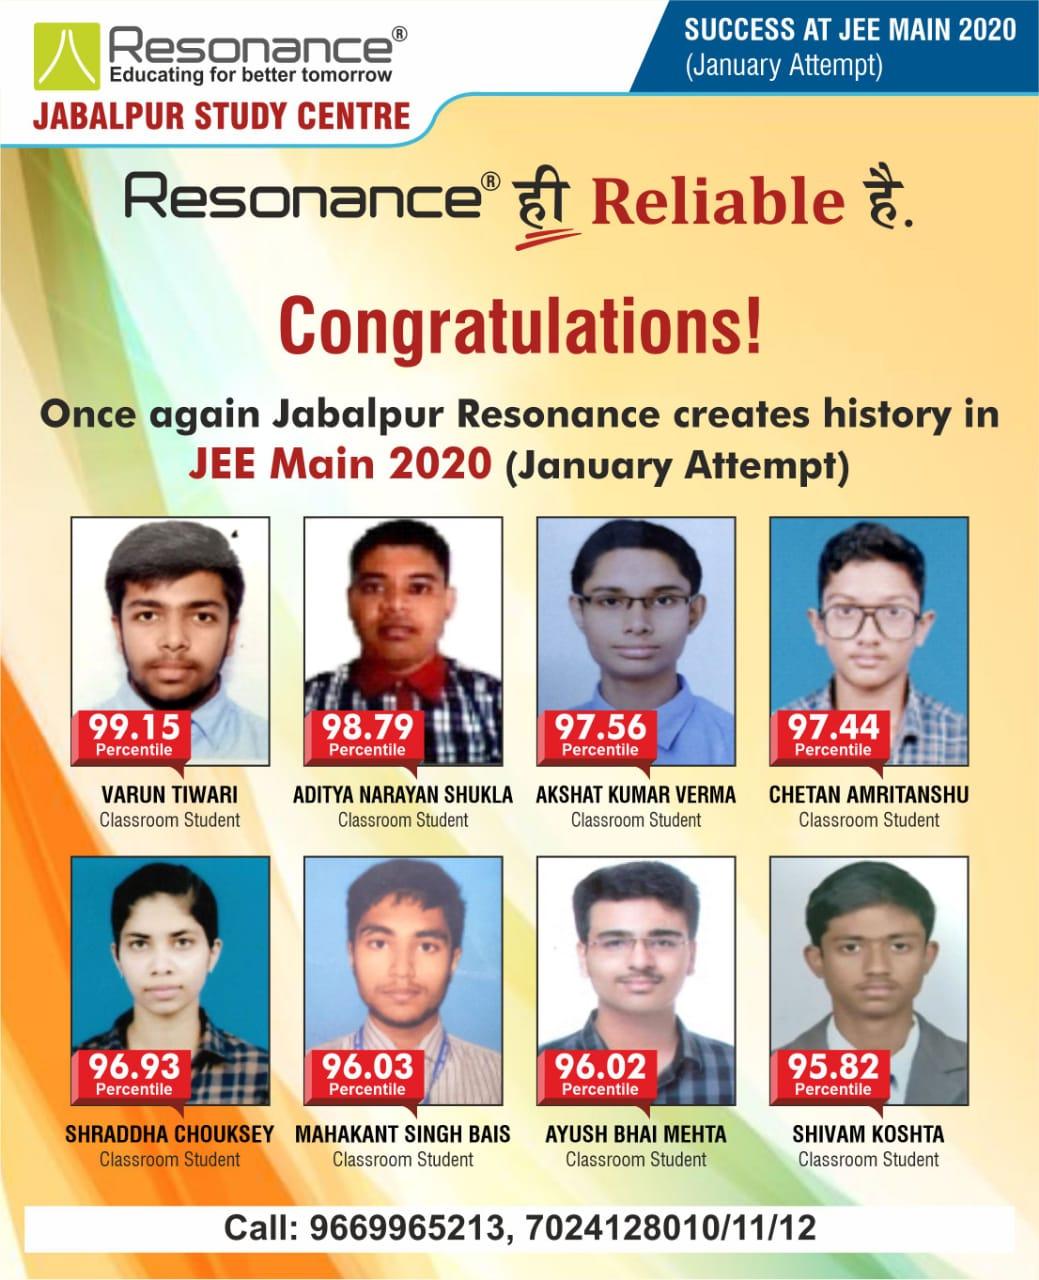 RESONANCE JABALPUR..RELIABLE RESULTS..